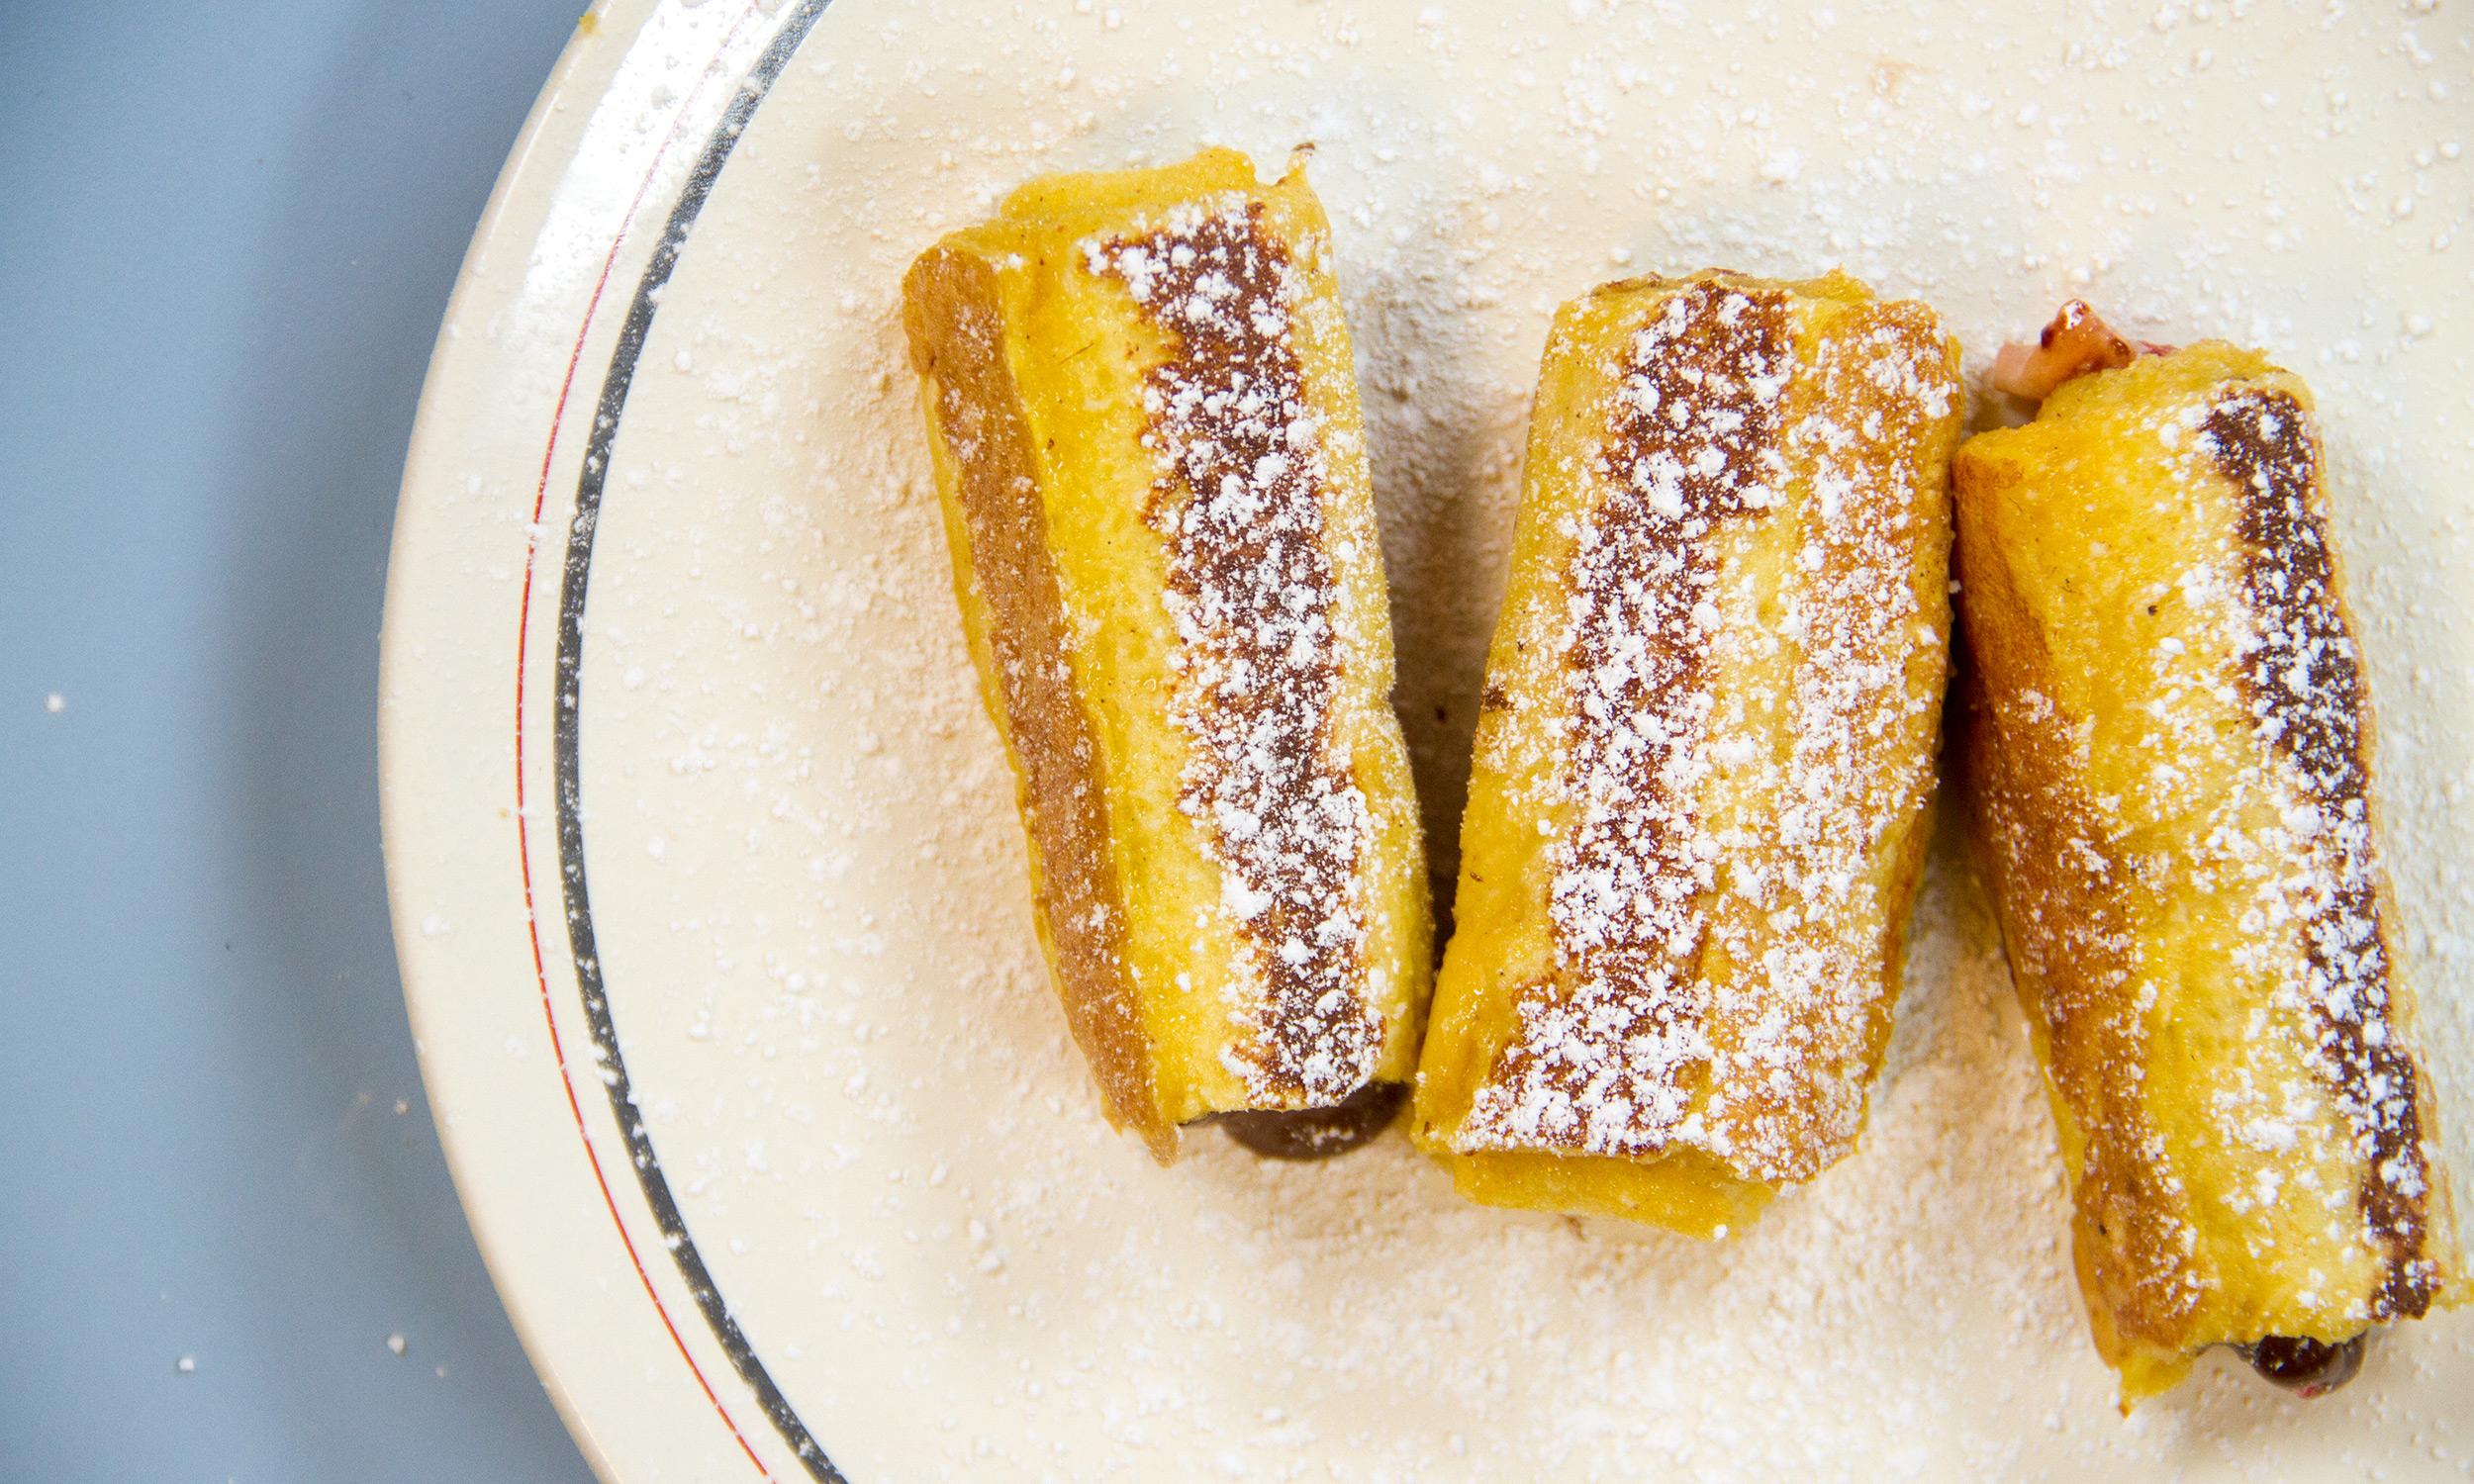 Strawberry Nutella French Toast Rollups (because You Deserve Joy)  Extra  Crispy